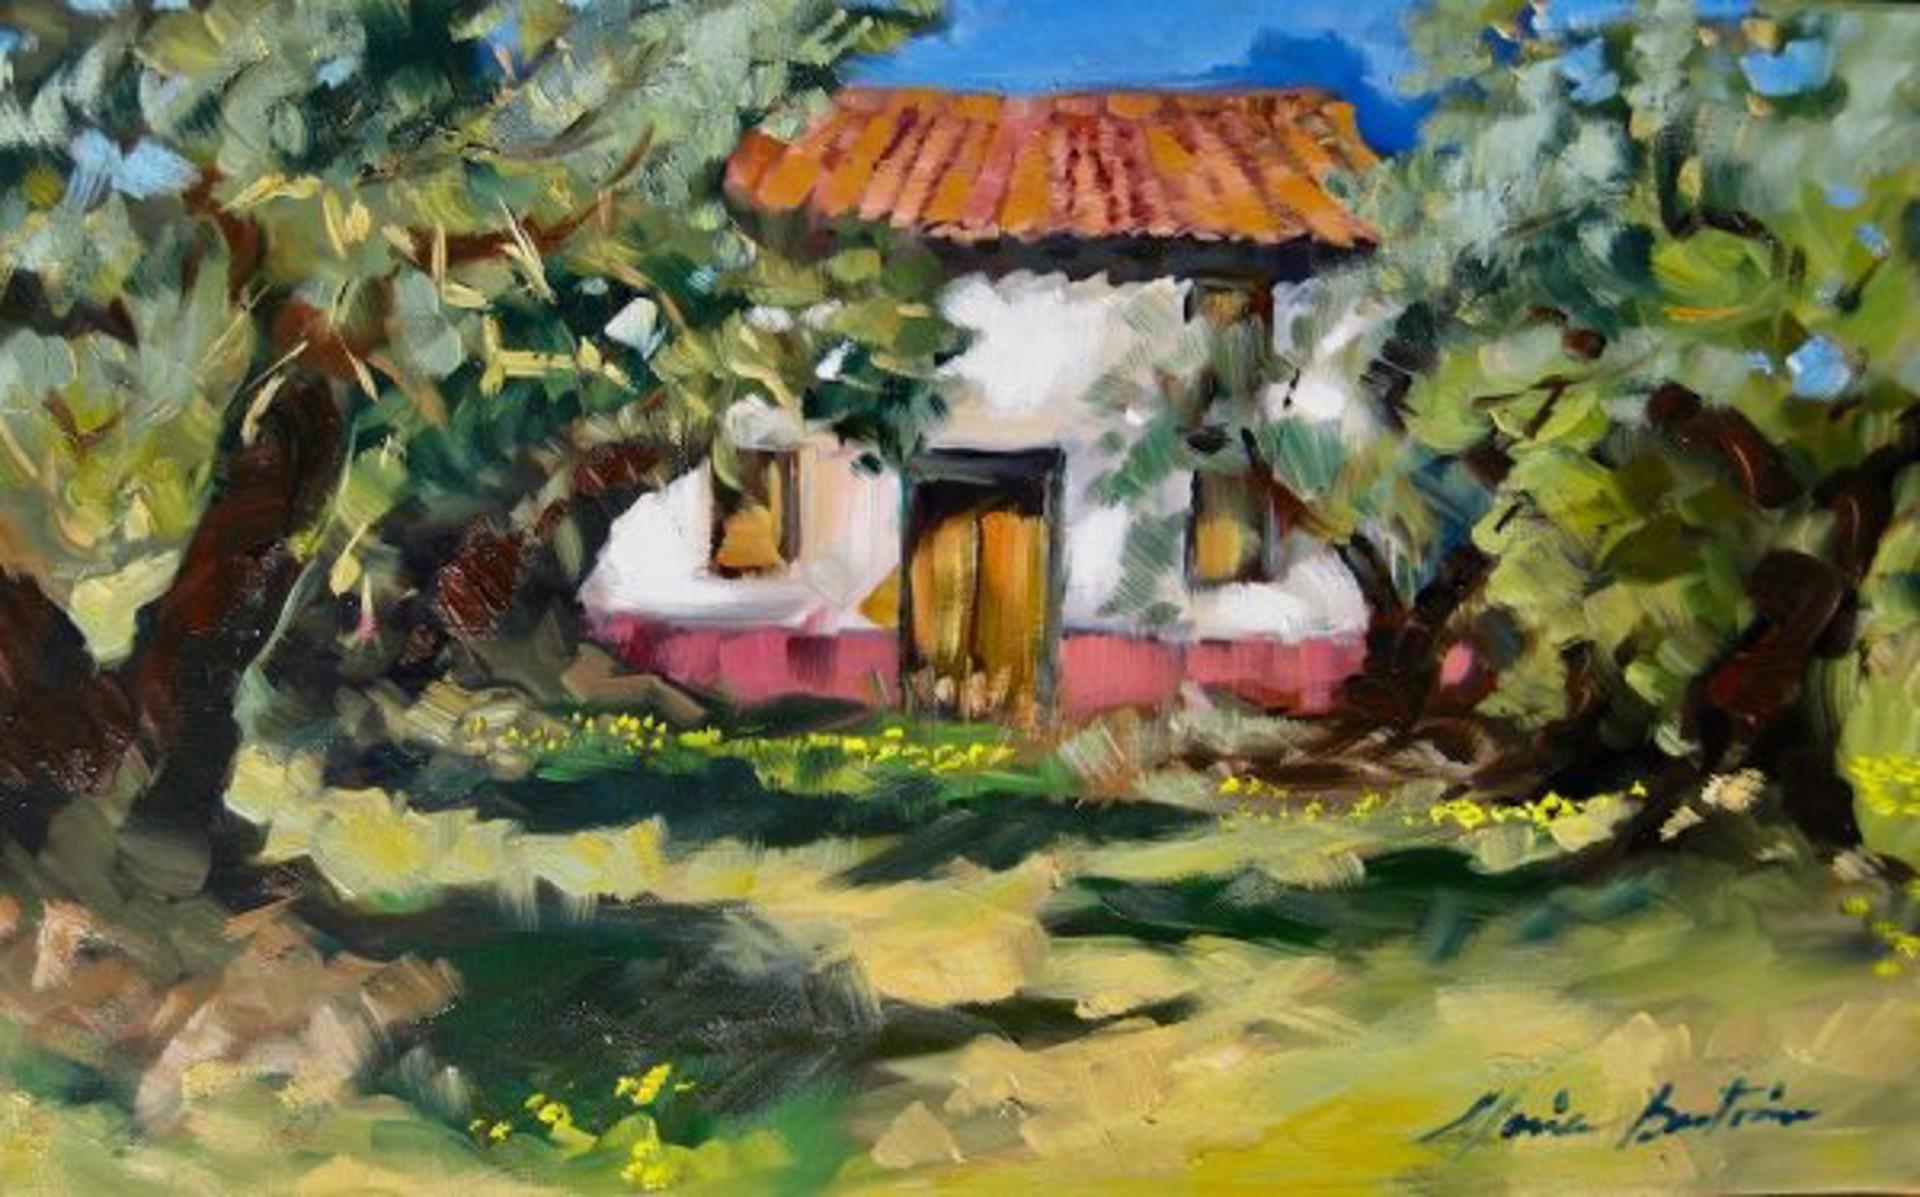 Spanish Olive Grove by Maria Bertrán